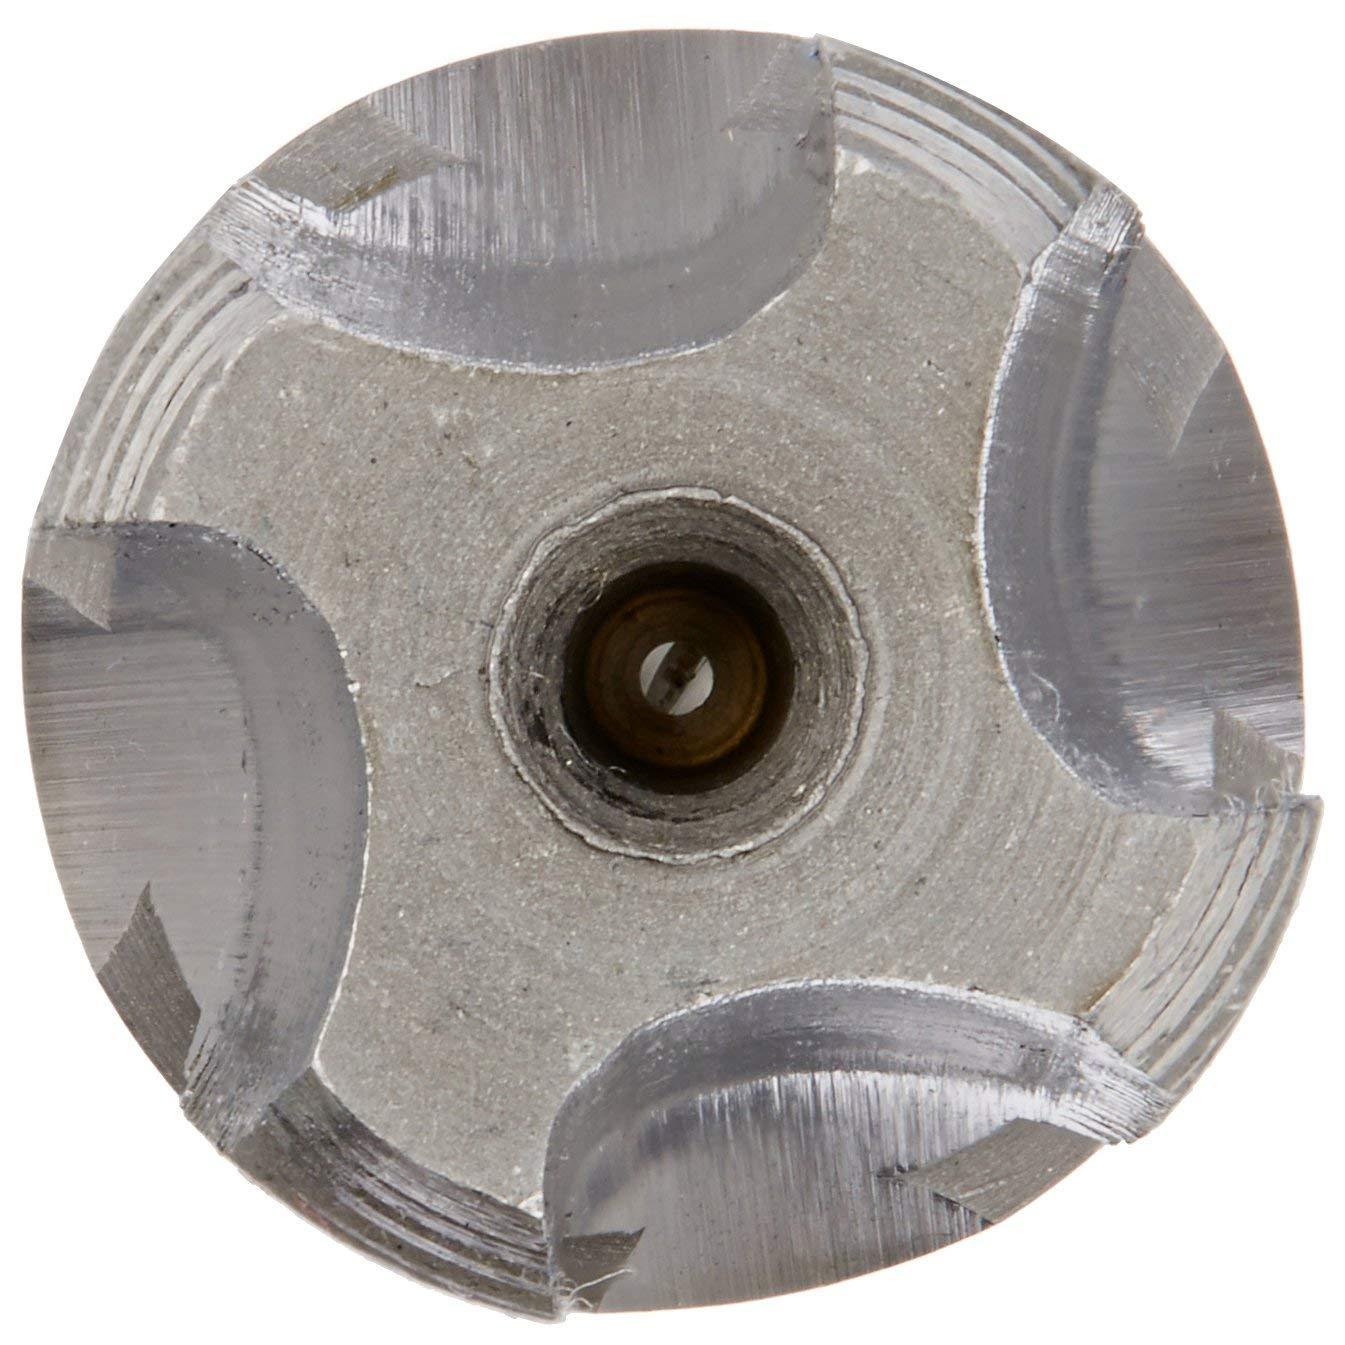 DWTPT Series Carbon Steel Drill America 1-1//2-11-1//2 NPT Pipe Tap